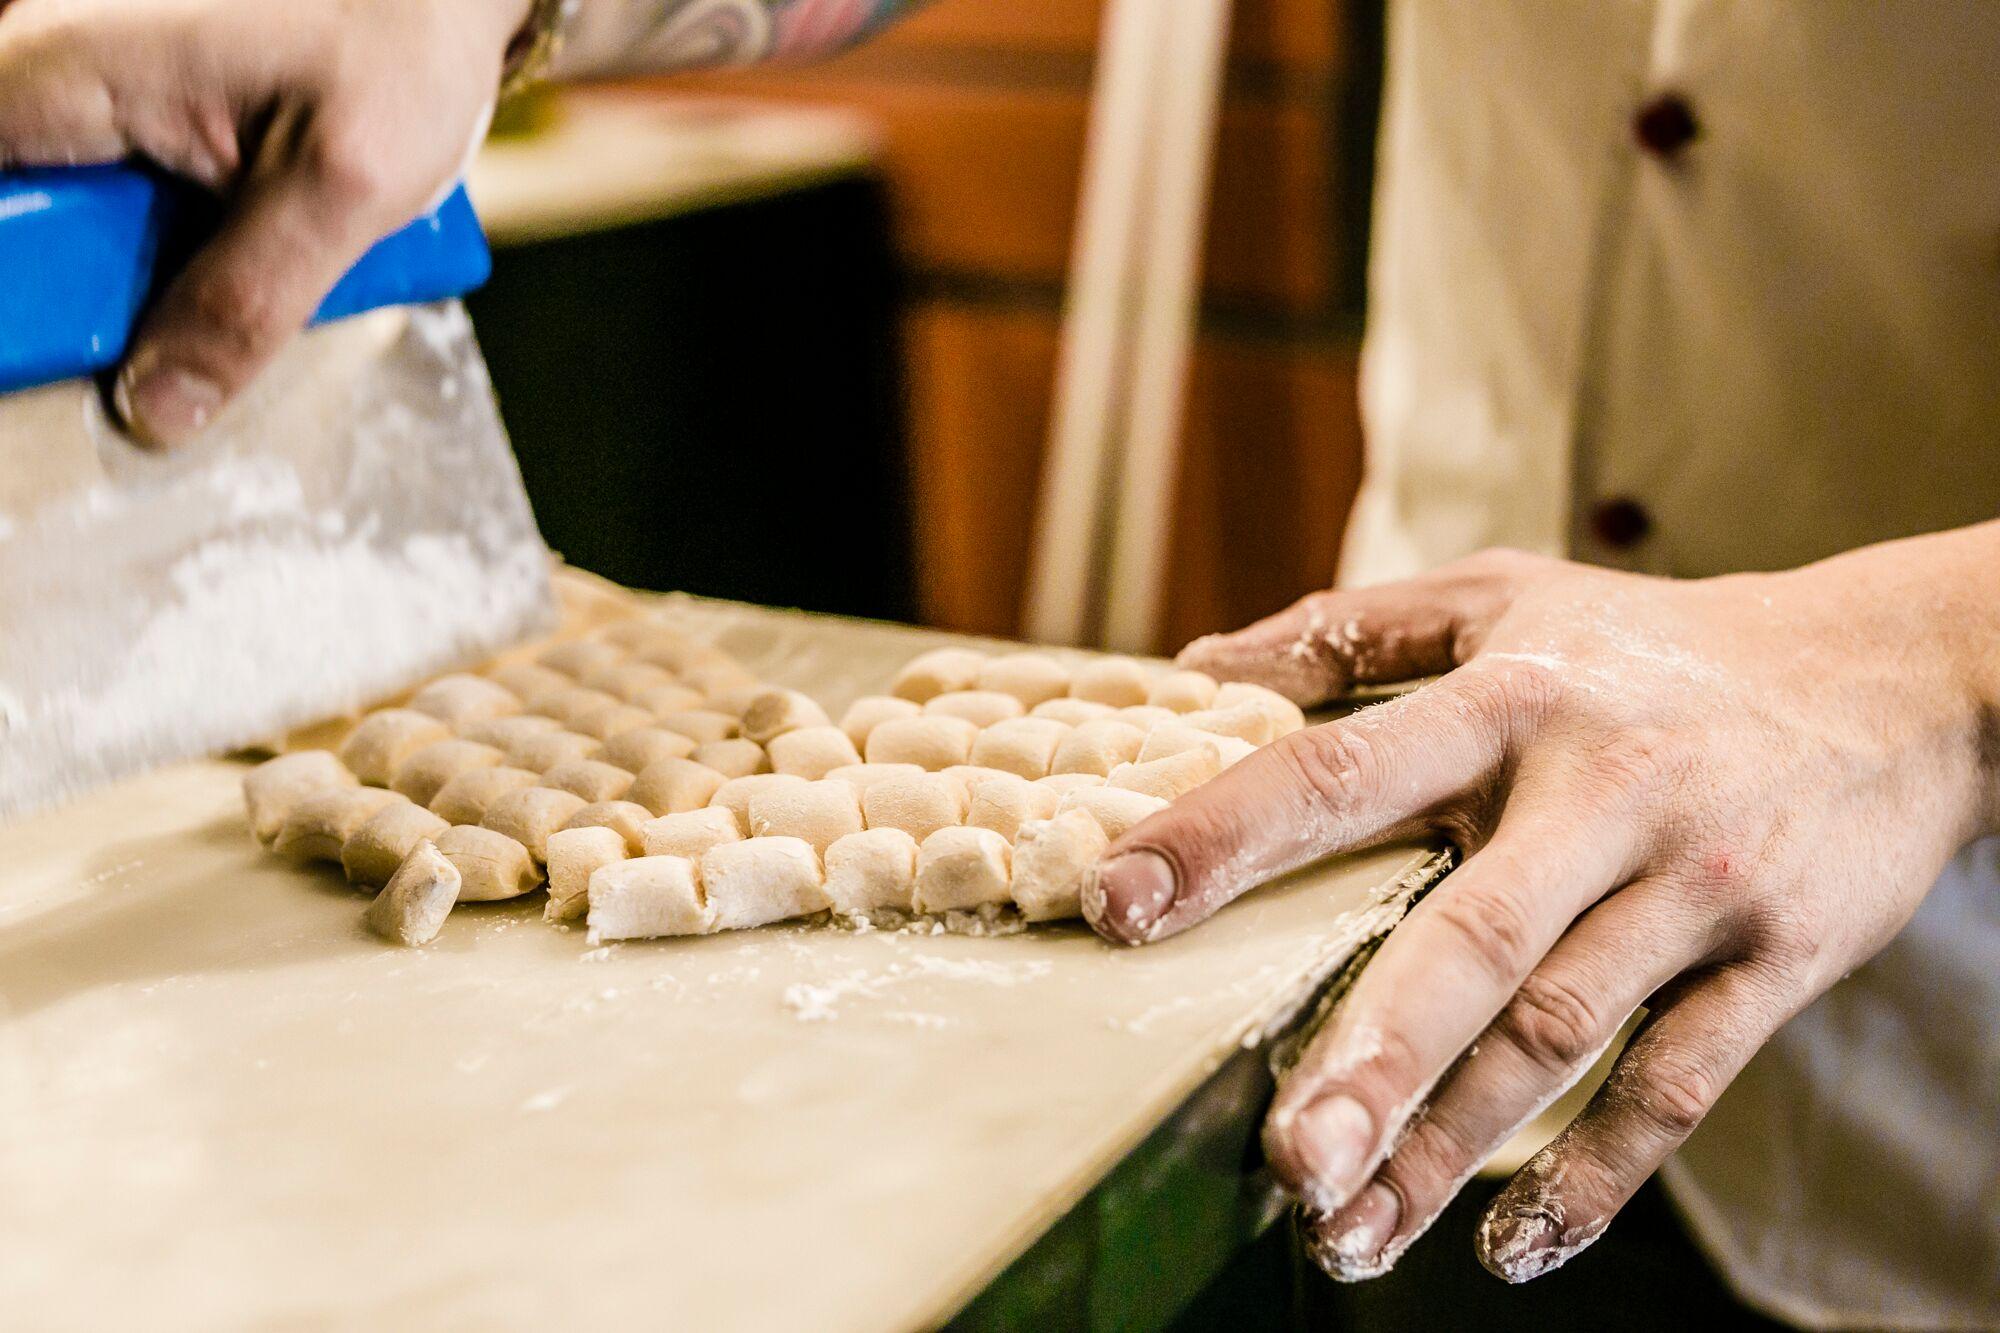 gnocchi making masterclass melbourne